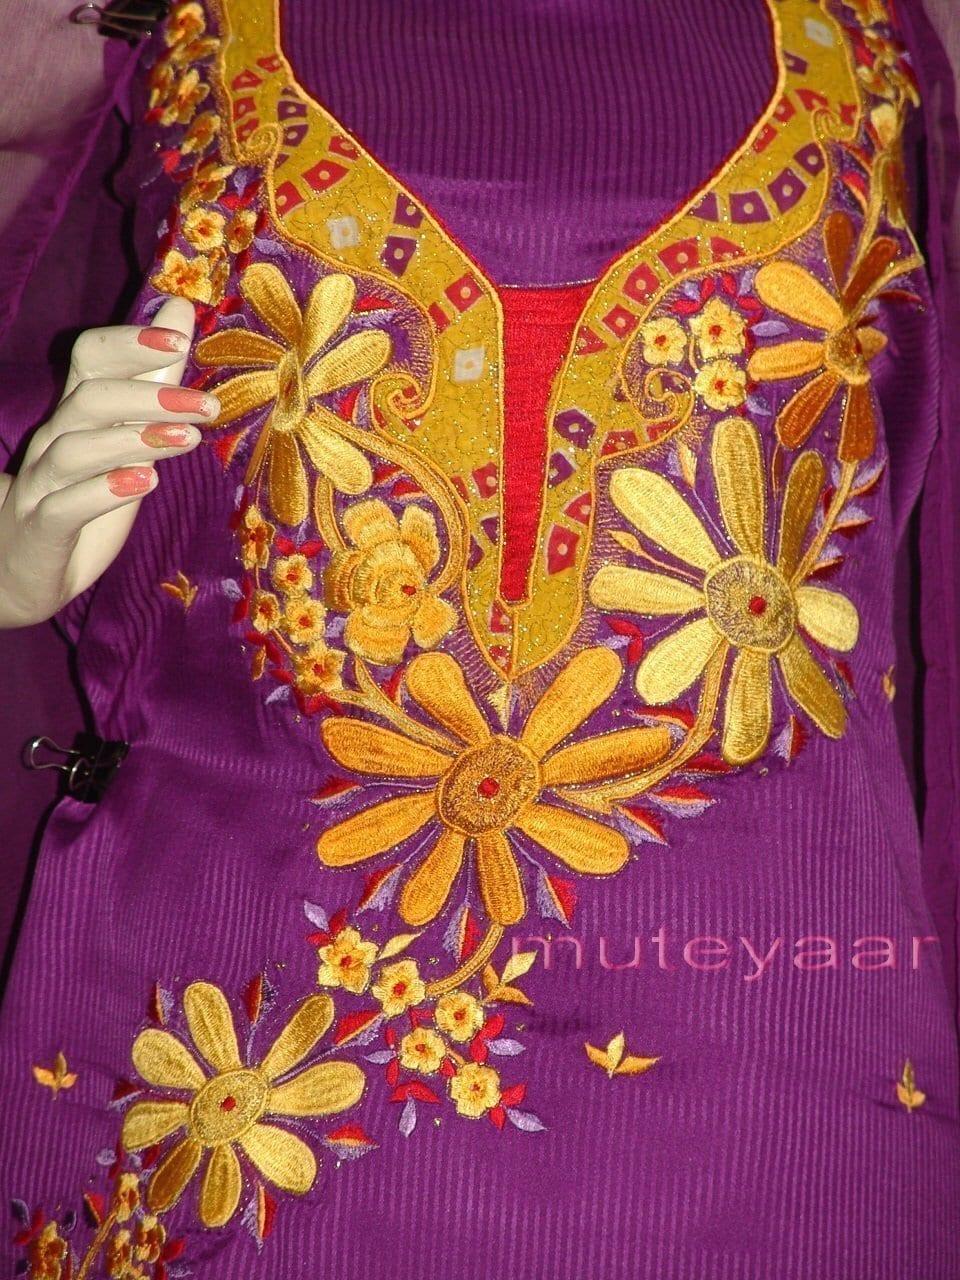 FULL PATIALA Salwar embr cotton Suit PURE CHIFFON Dupatta RM205 2